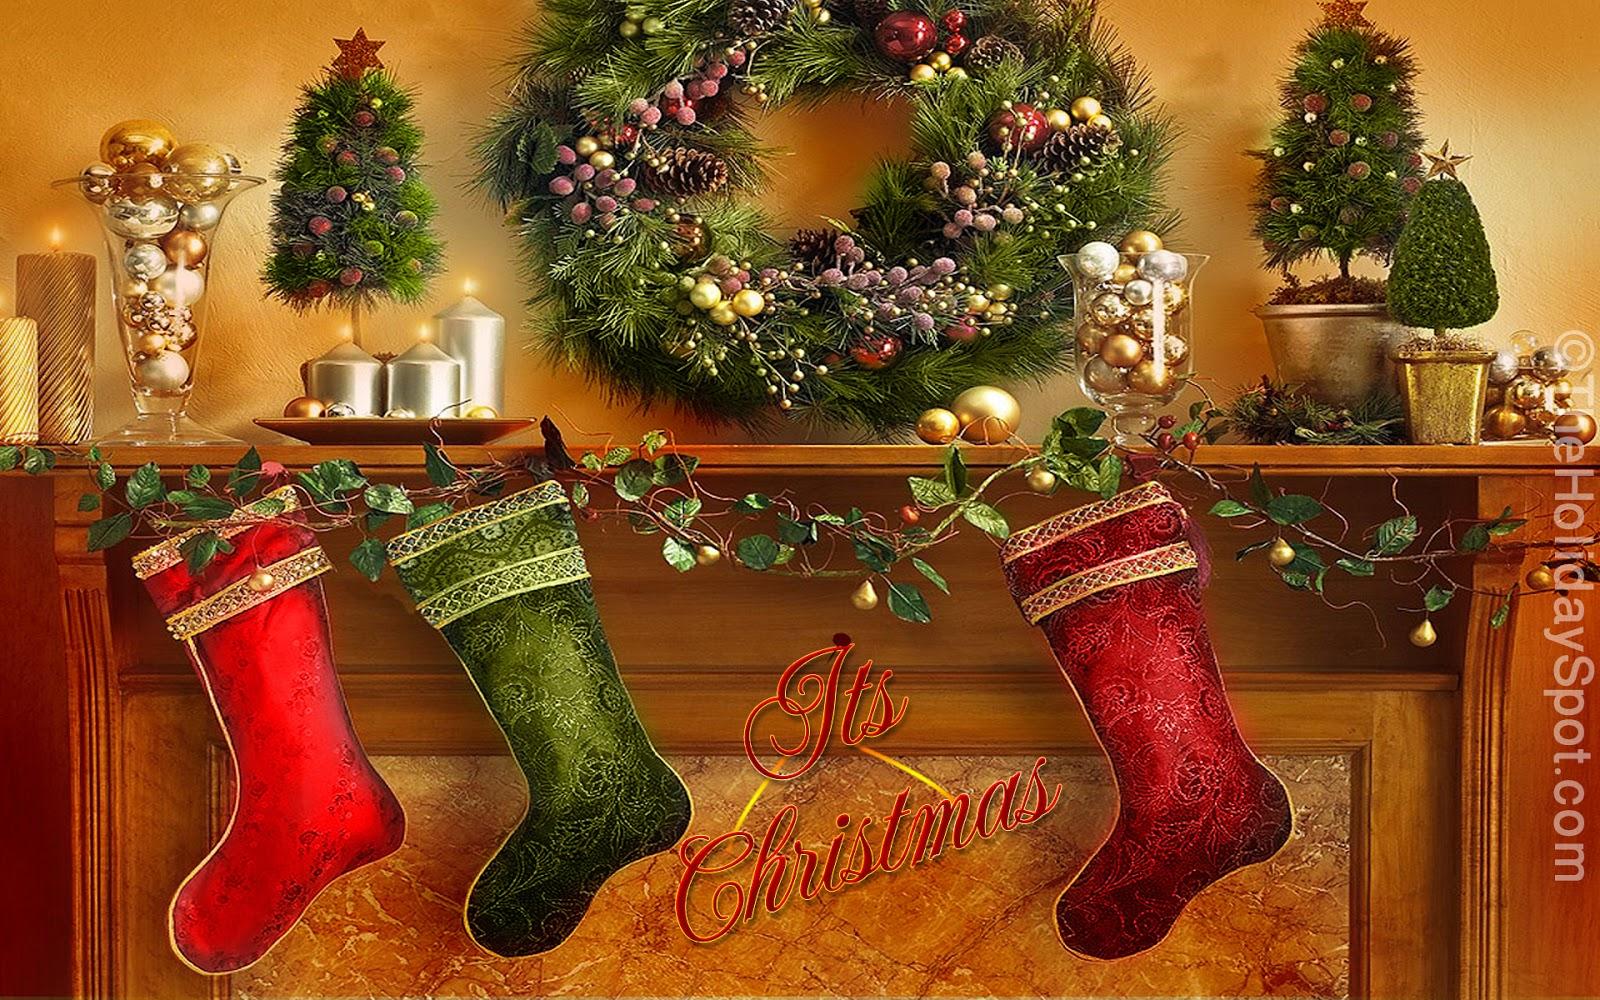 http://4.bp.blogspot.com/-iyYVH4QTpdQ/UNiIJHT1WkI/AAAAAAAAJVQ/zctFiqeZERk/s1600/Merry+Cristmas+greeting+(7).jpg